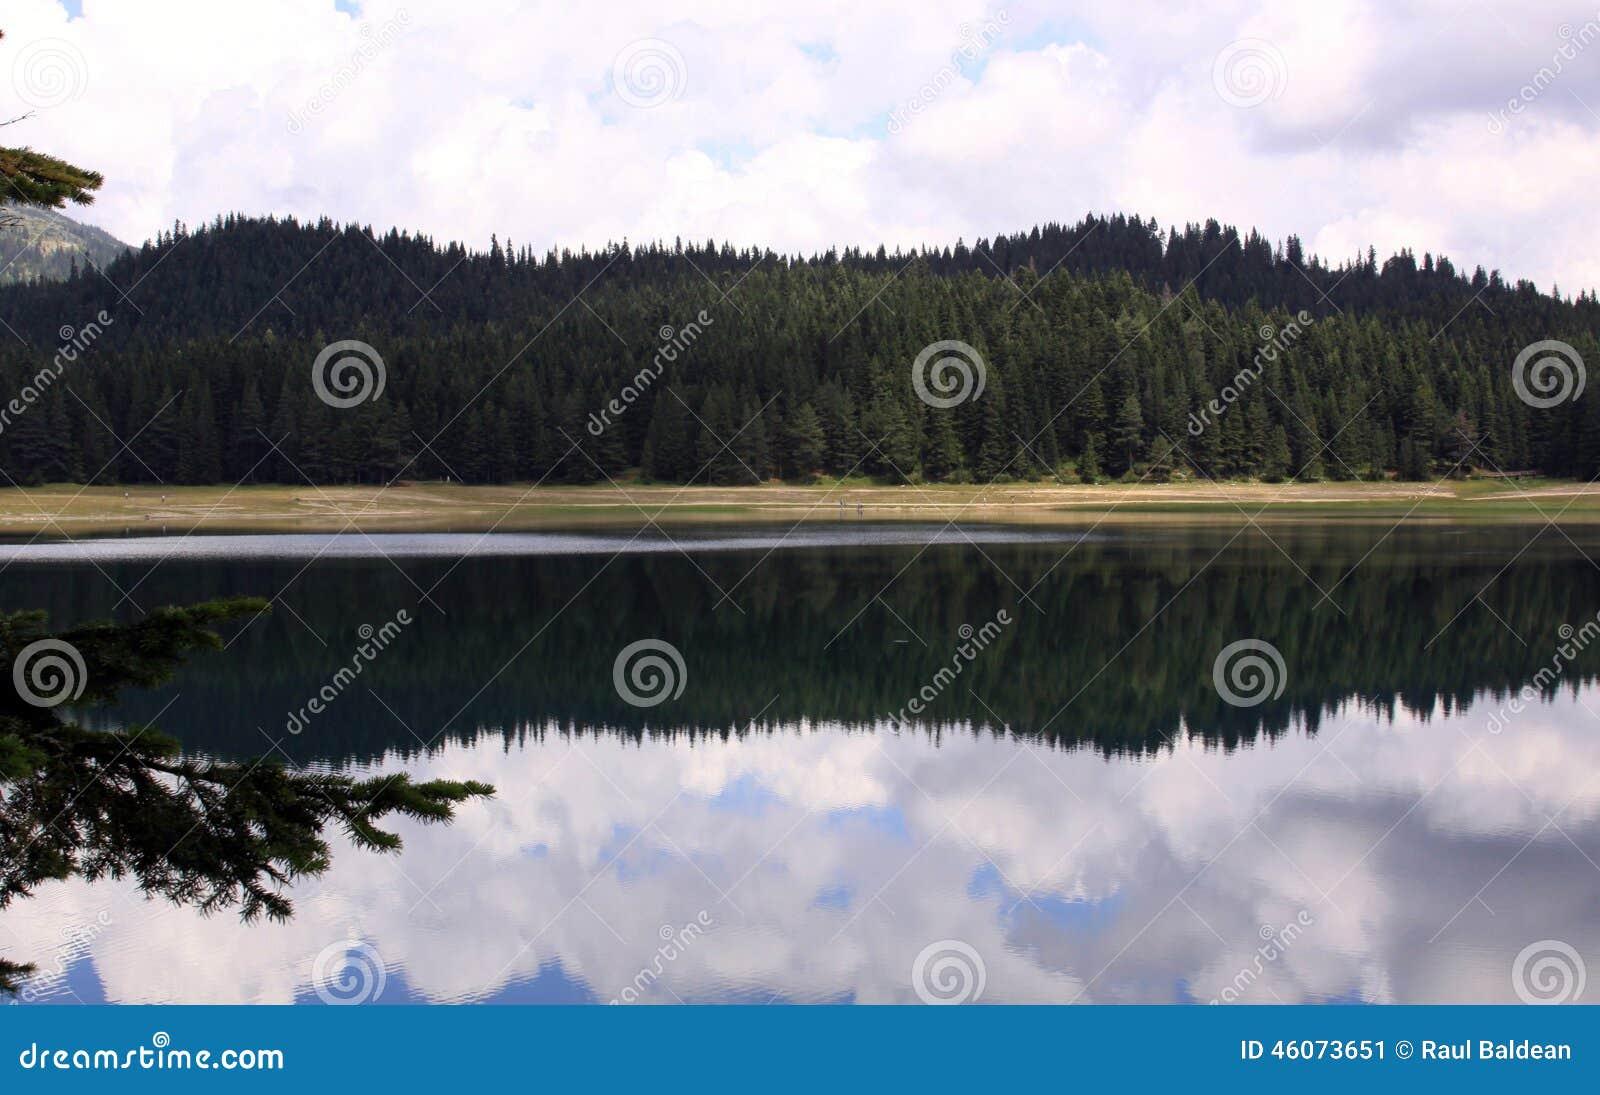 Crno Jezero (Black Lake), Durmitor National Park, Montenegro 01